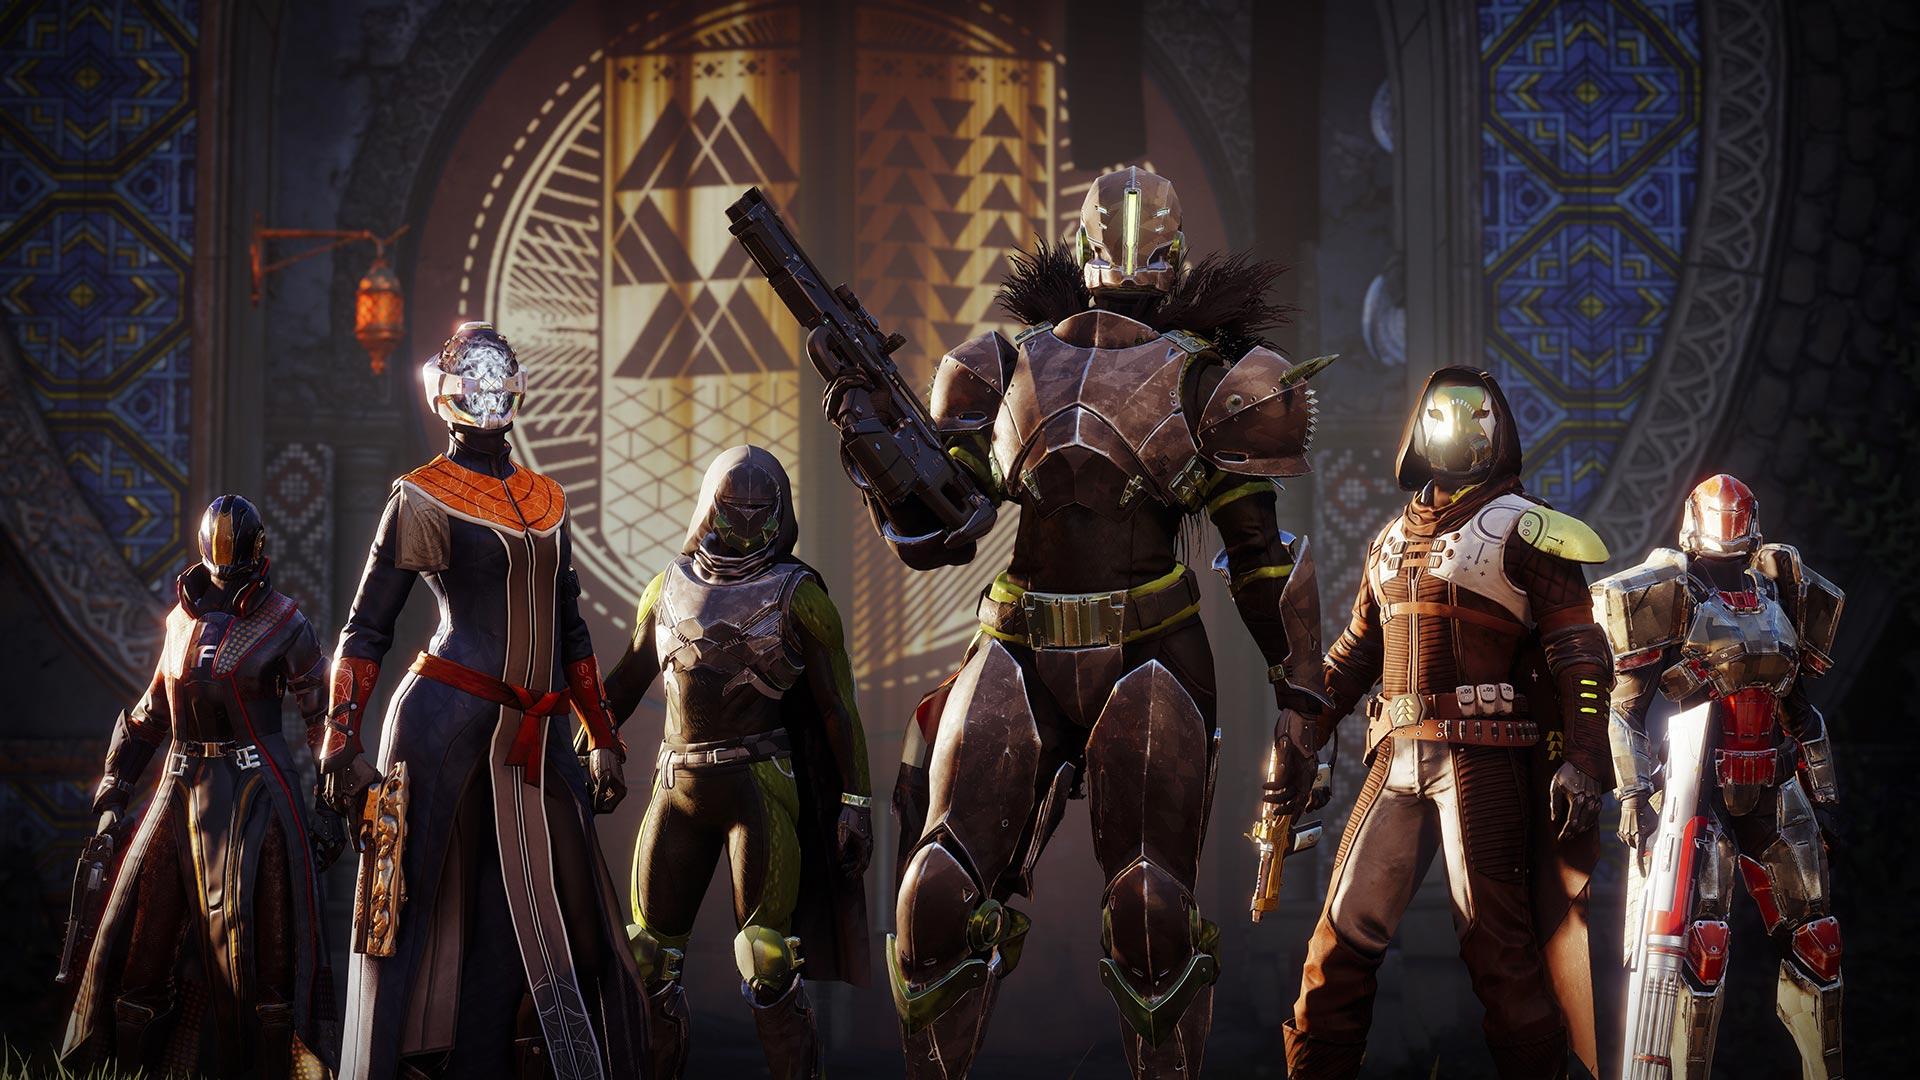 Light From Darkness Mod in Destiny 2